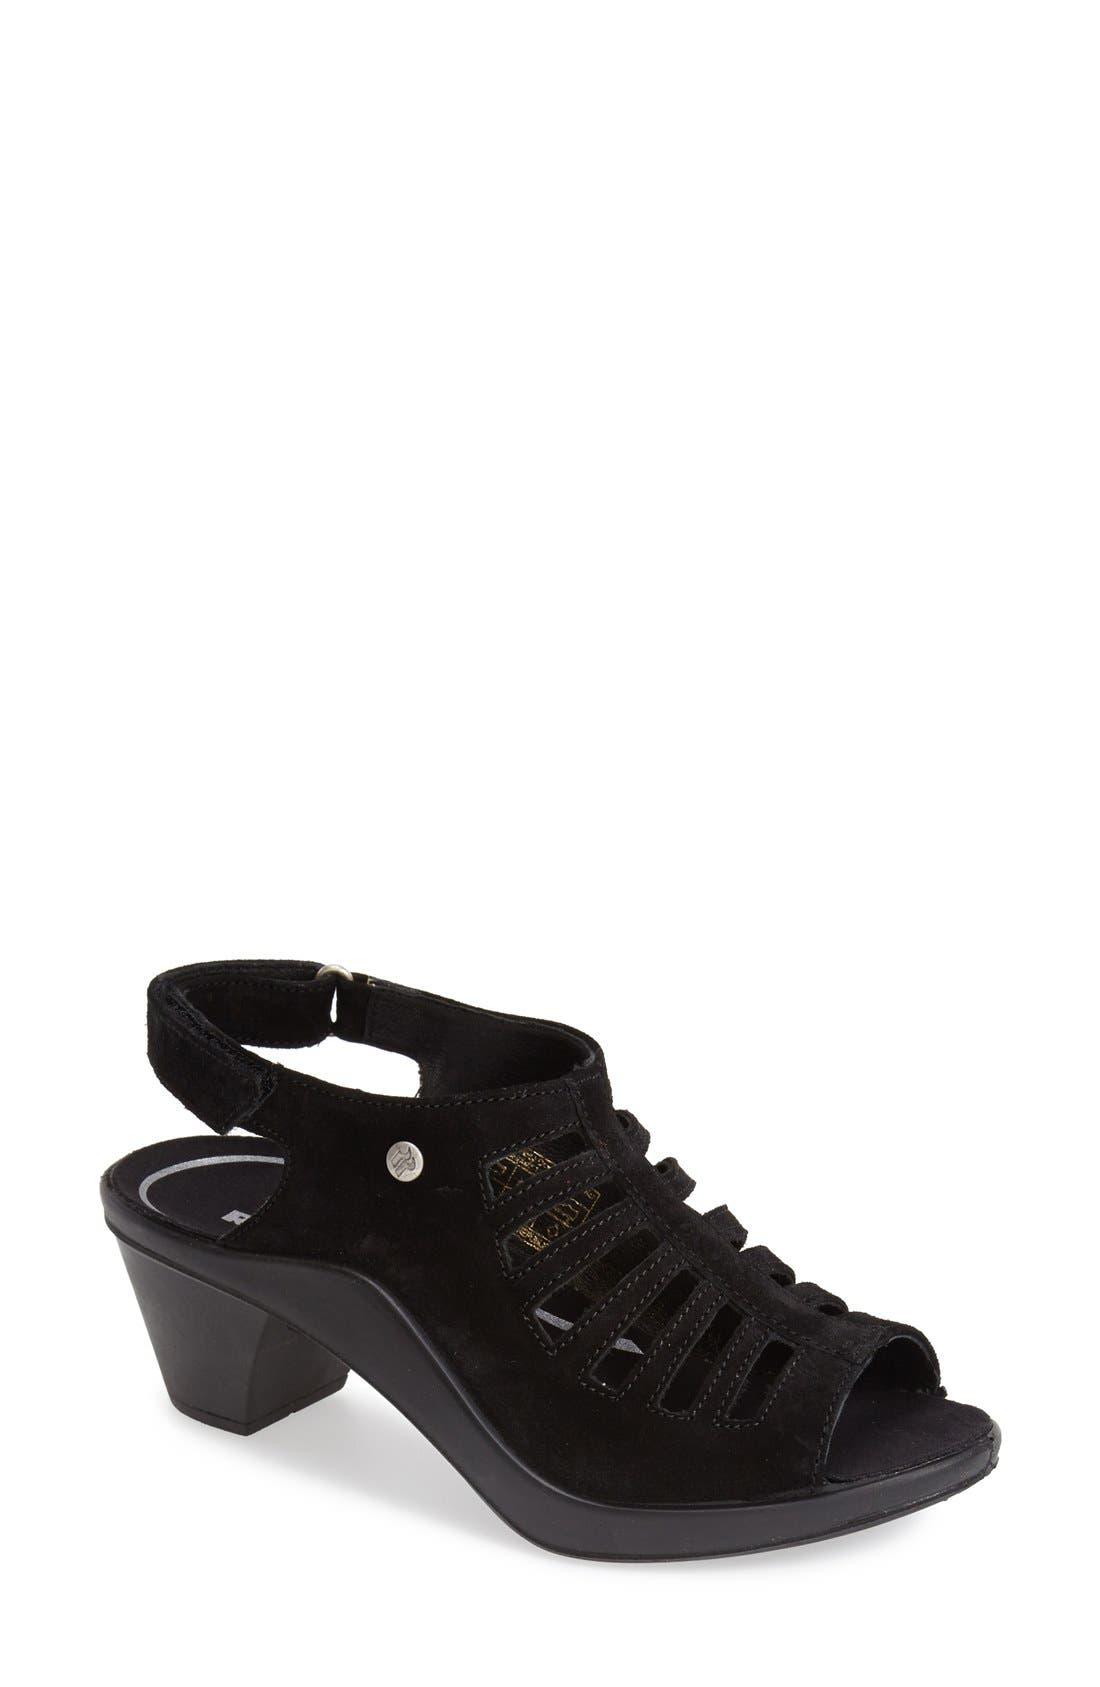 Romika® 'Mokasetta 287' Cutout Suede Sandal (Women)